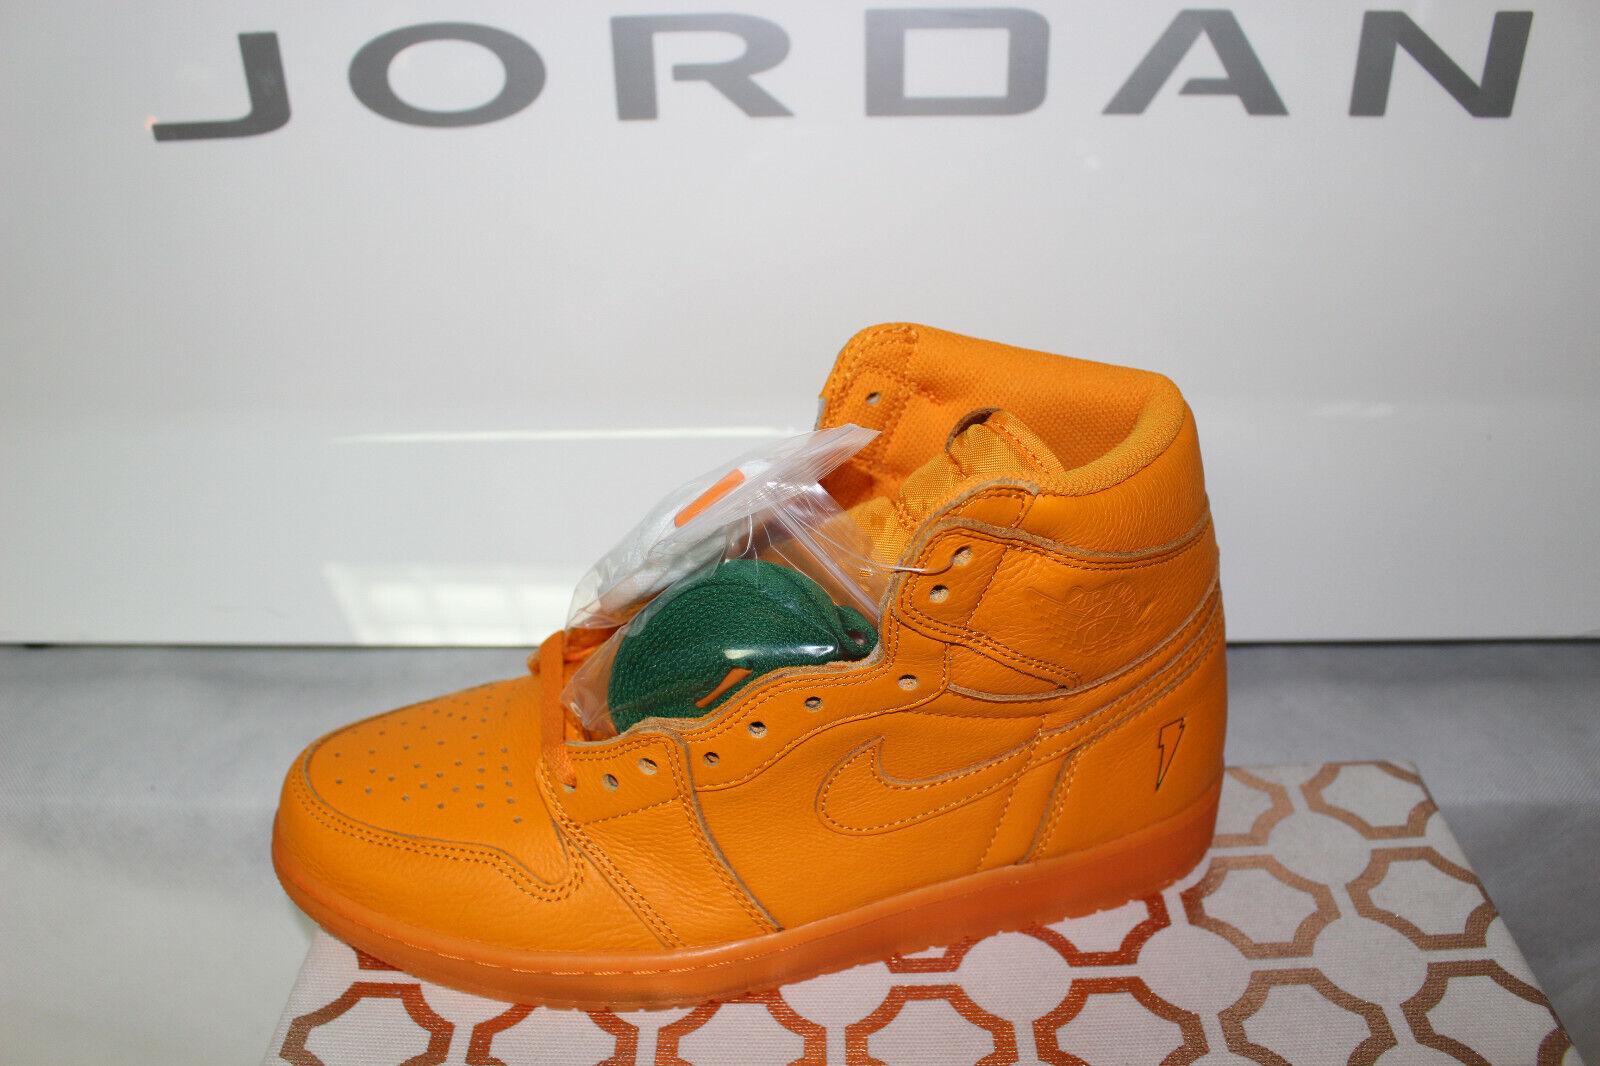 Nike Jordan Retro 1 OG Gatorade orange Peel AJ5997-880, New Size 10.5